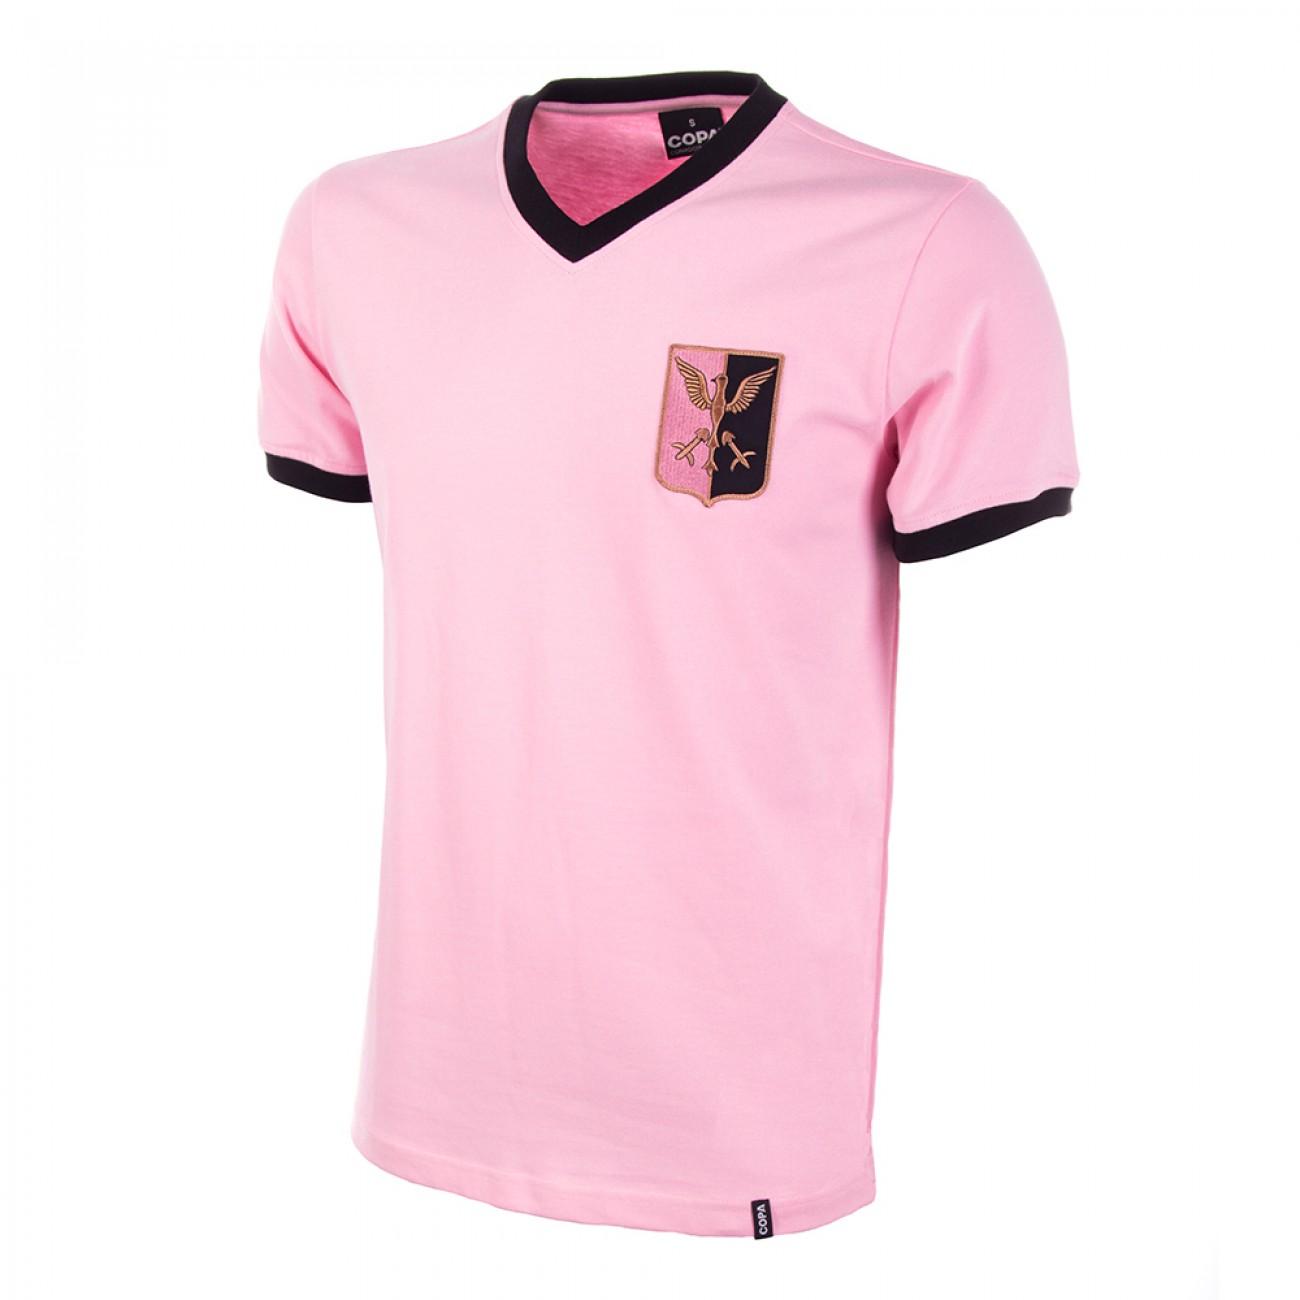 http://www.retrofootball.es/ropa-de-futbol/camiseta-palermo-a-os-70.html